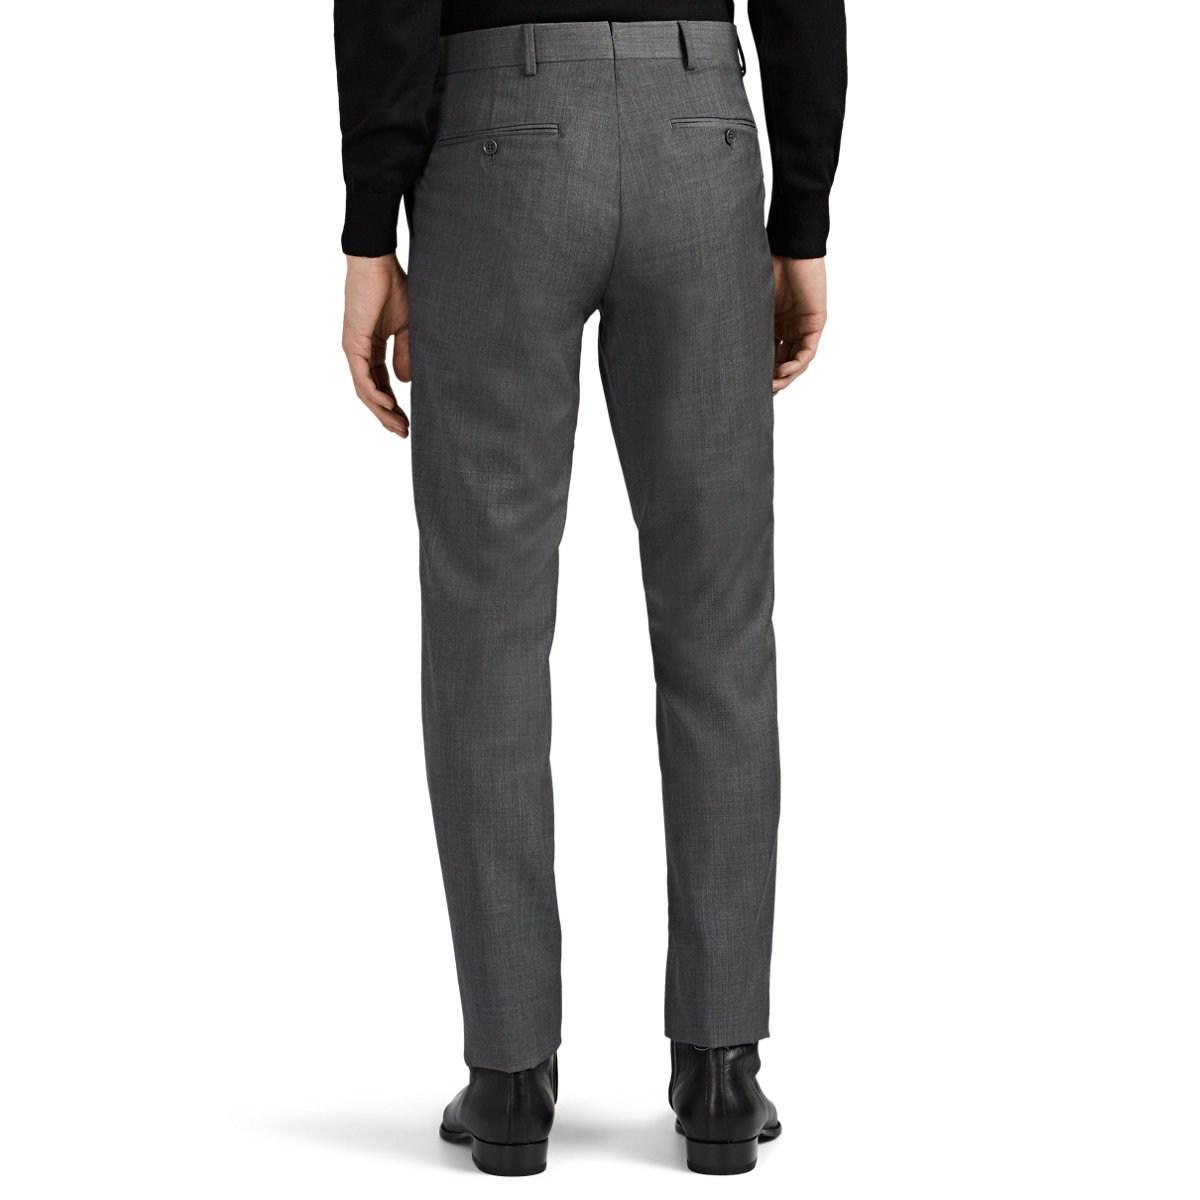 Ralph Lauren Purple Label Mens Anthony Charcoal Wool Cashmere Flannel Trouser